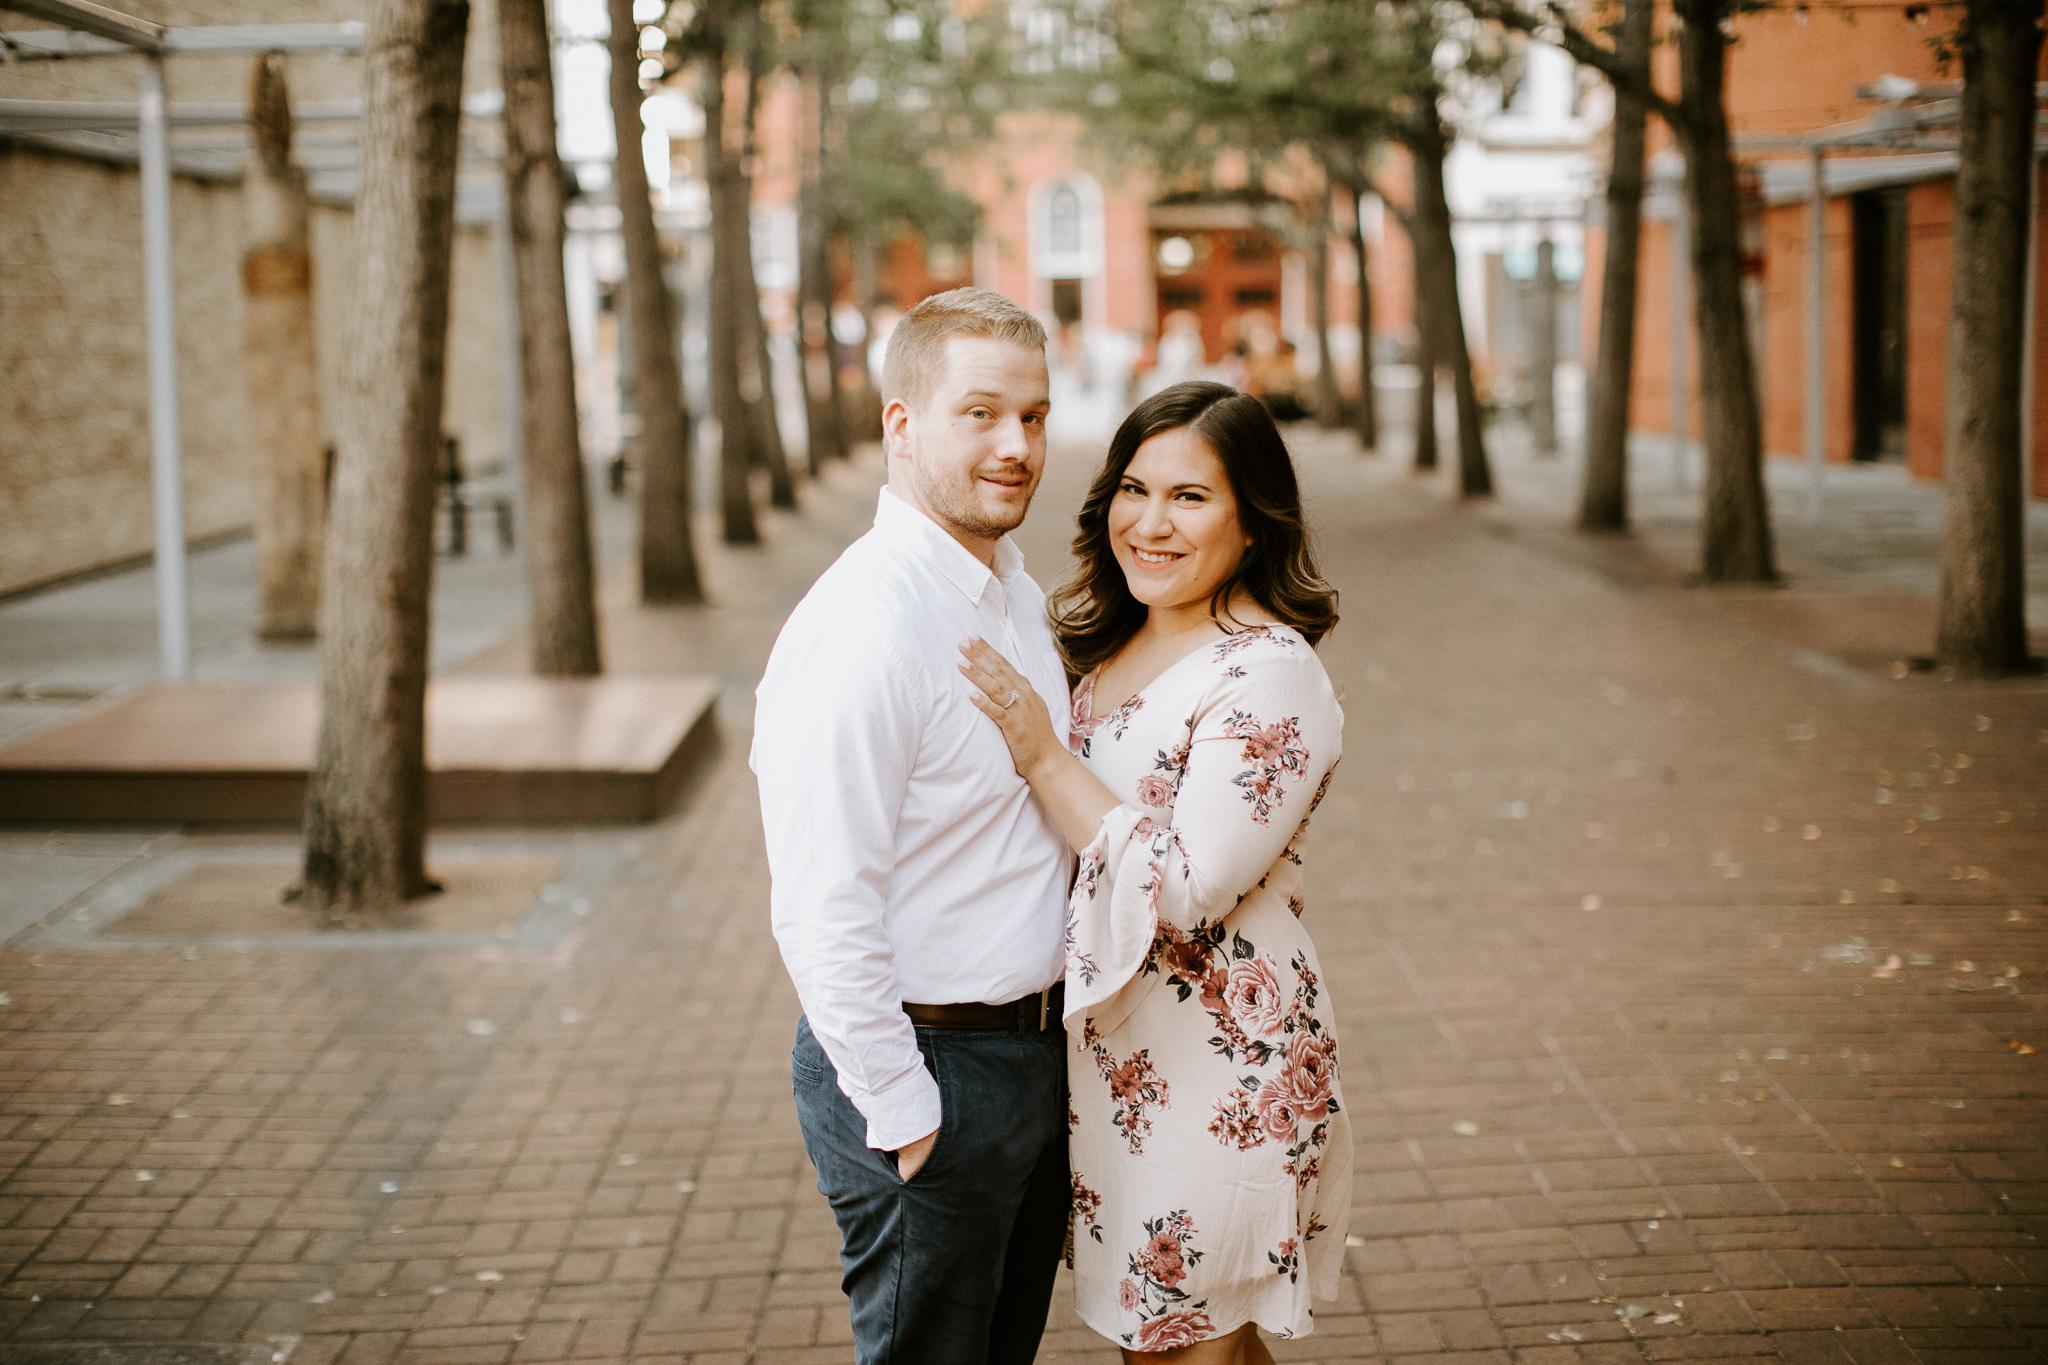 Engagement - Downtown Roanoke -  Wedding Photographer - Virginia - Best - Pat Cori Photography-13.jpg